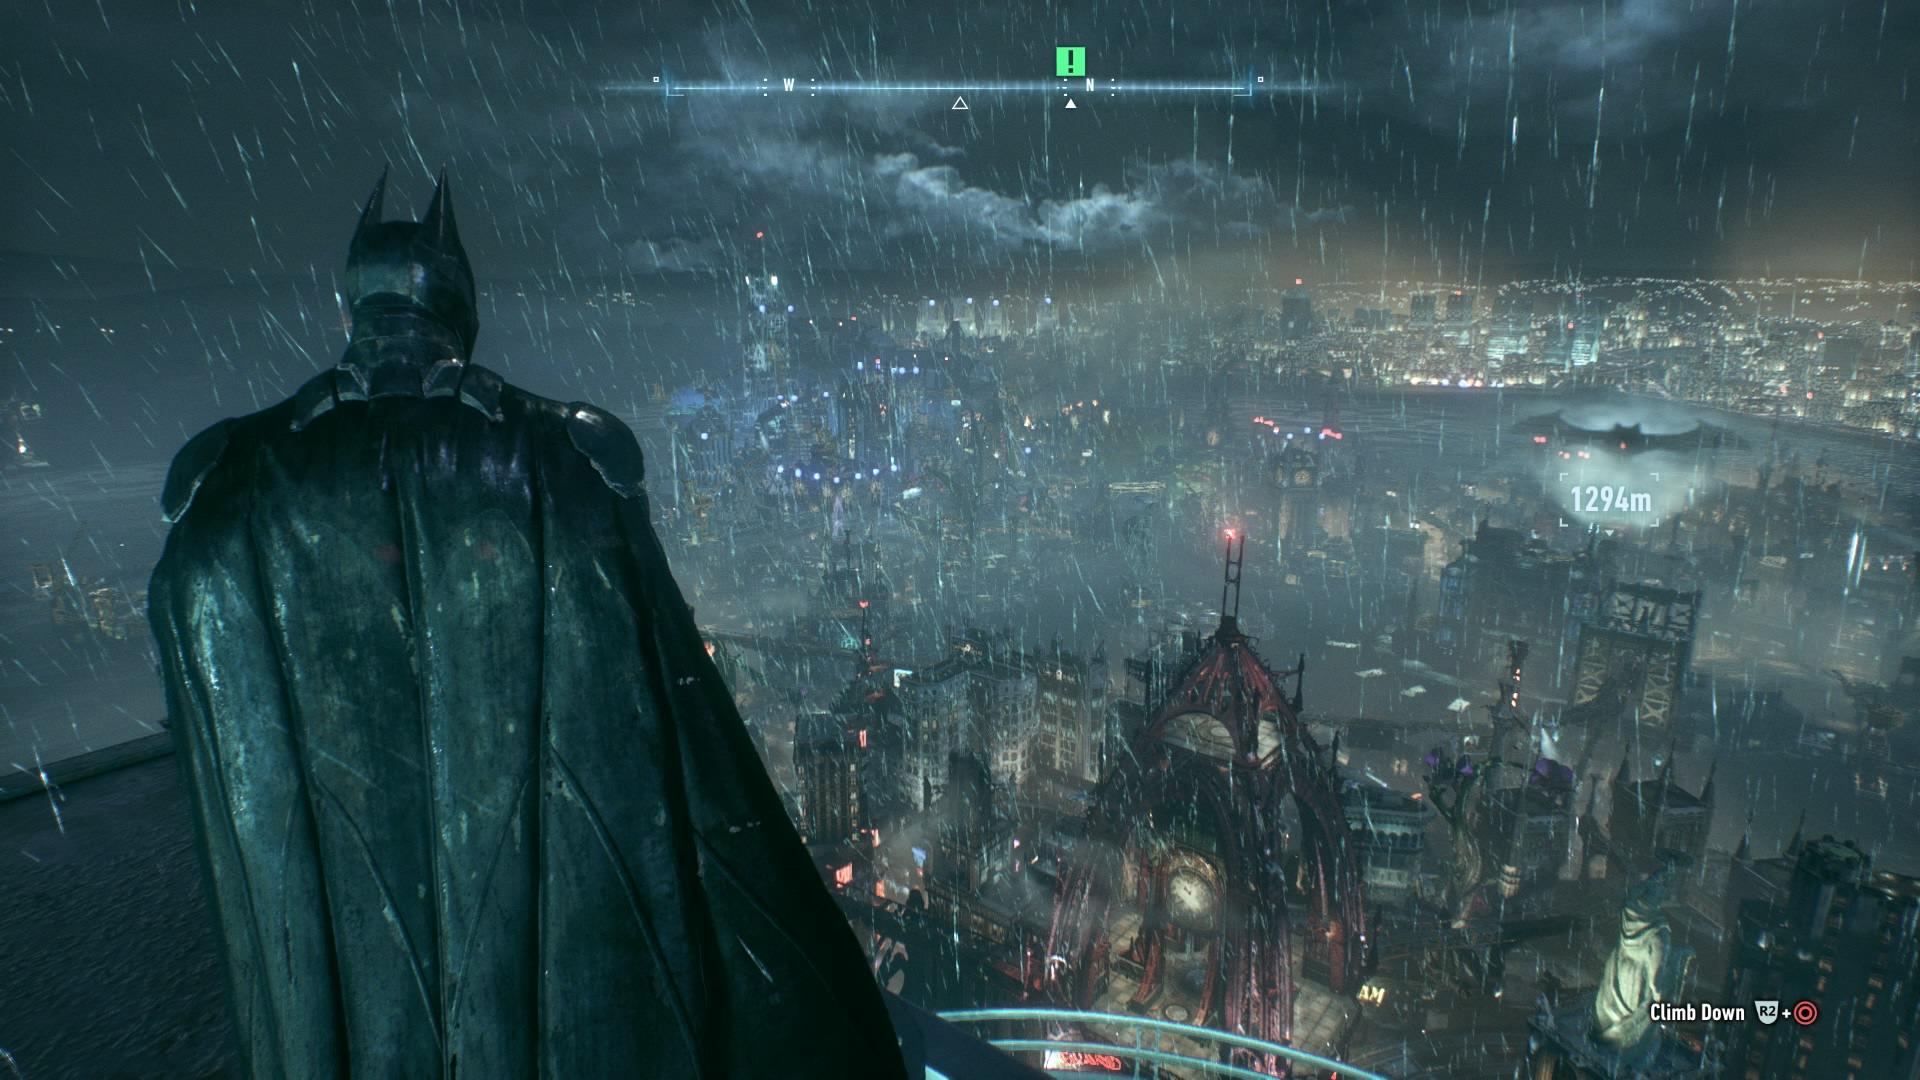 Recenze: Batman Arkham Knight – Strach nad Gothamem 10717